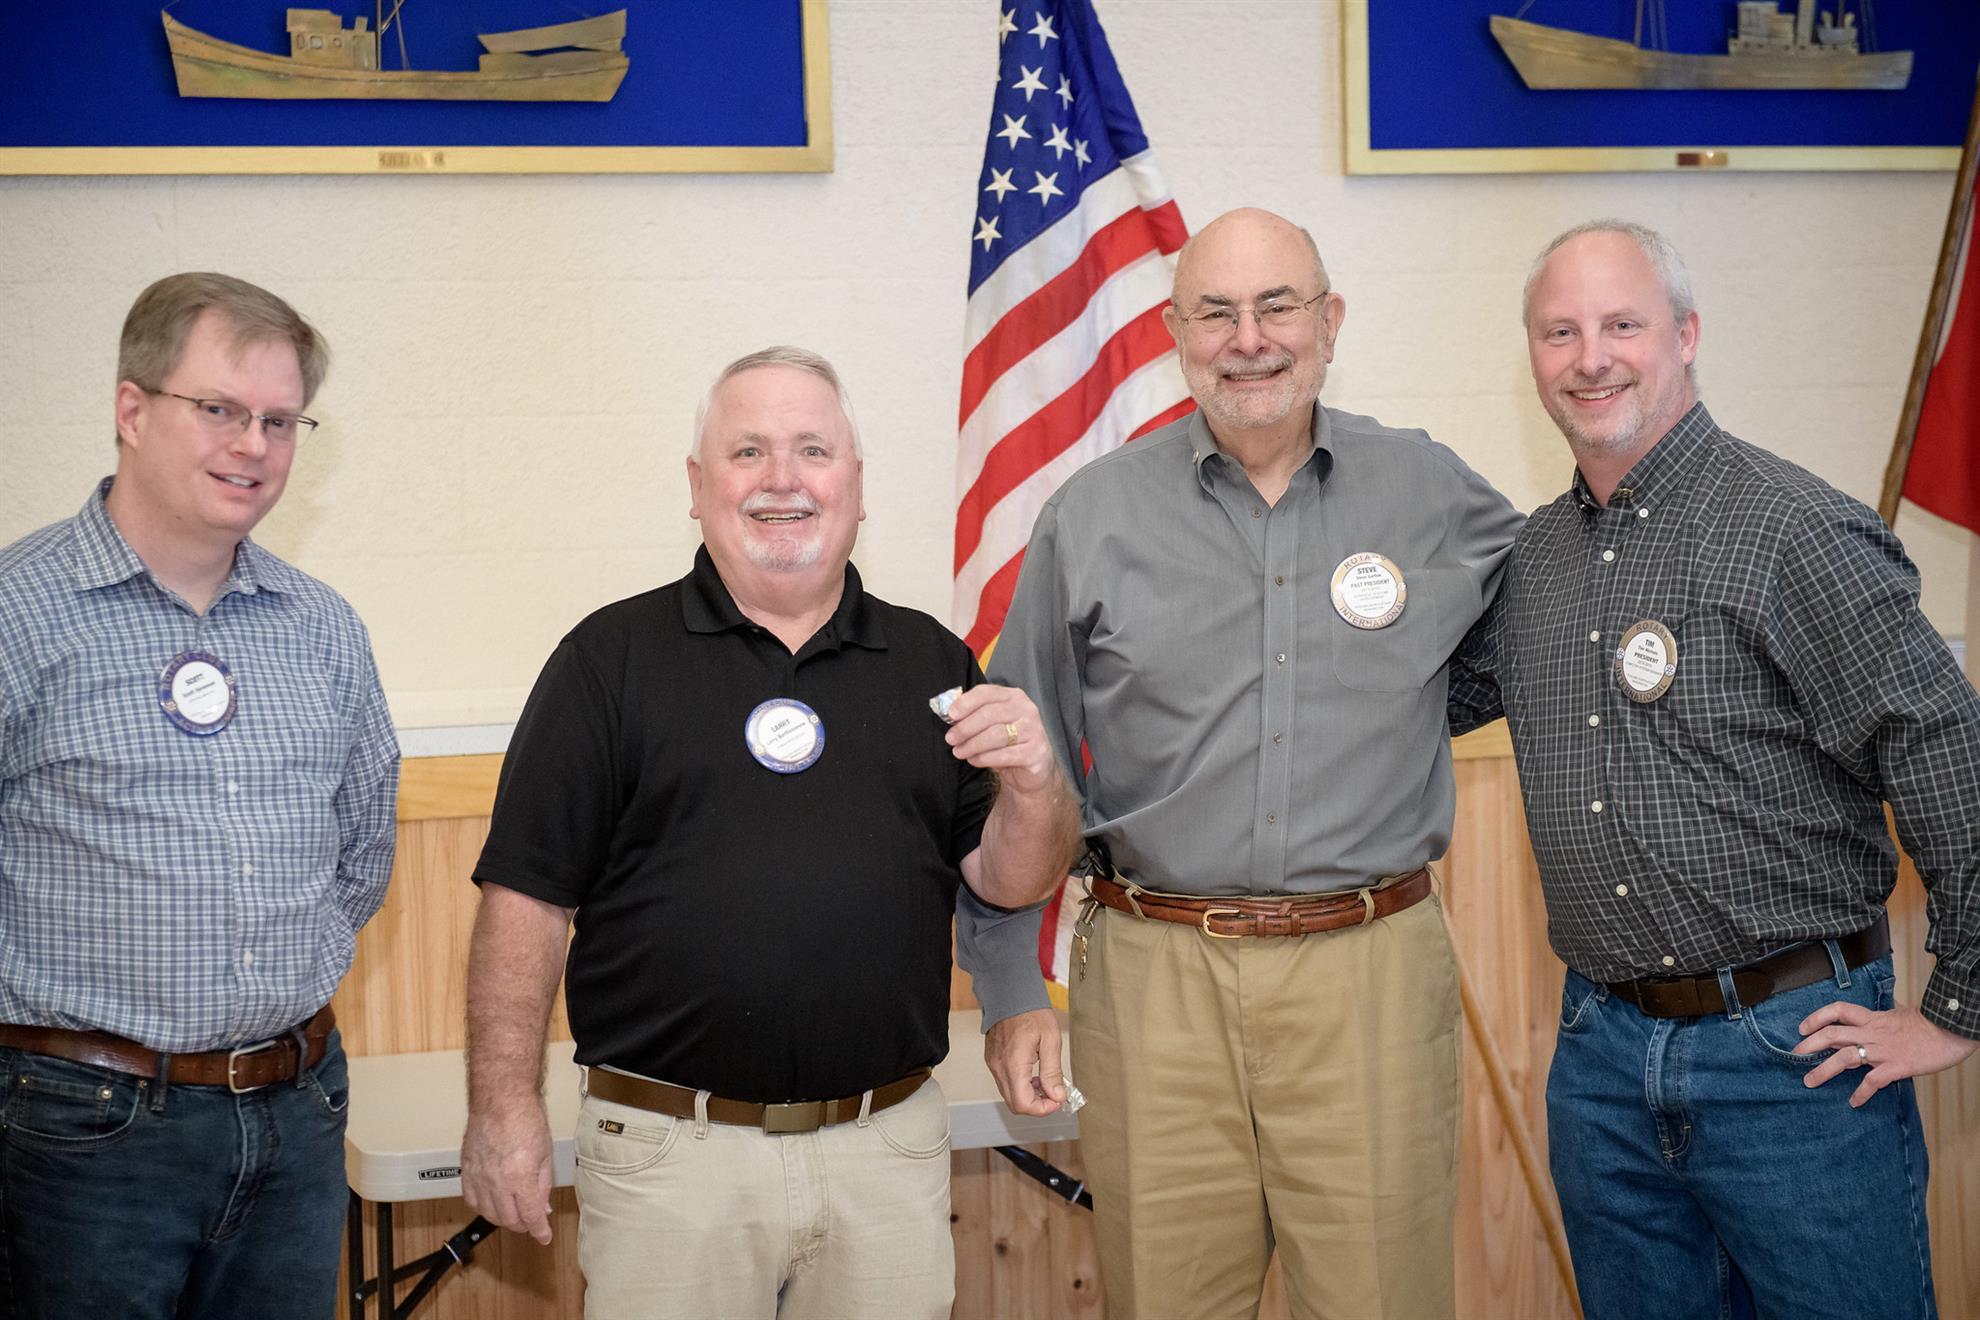 Scott Sorensen, Larry Bartholomew, and Steve Garfein